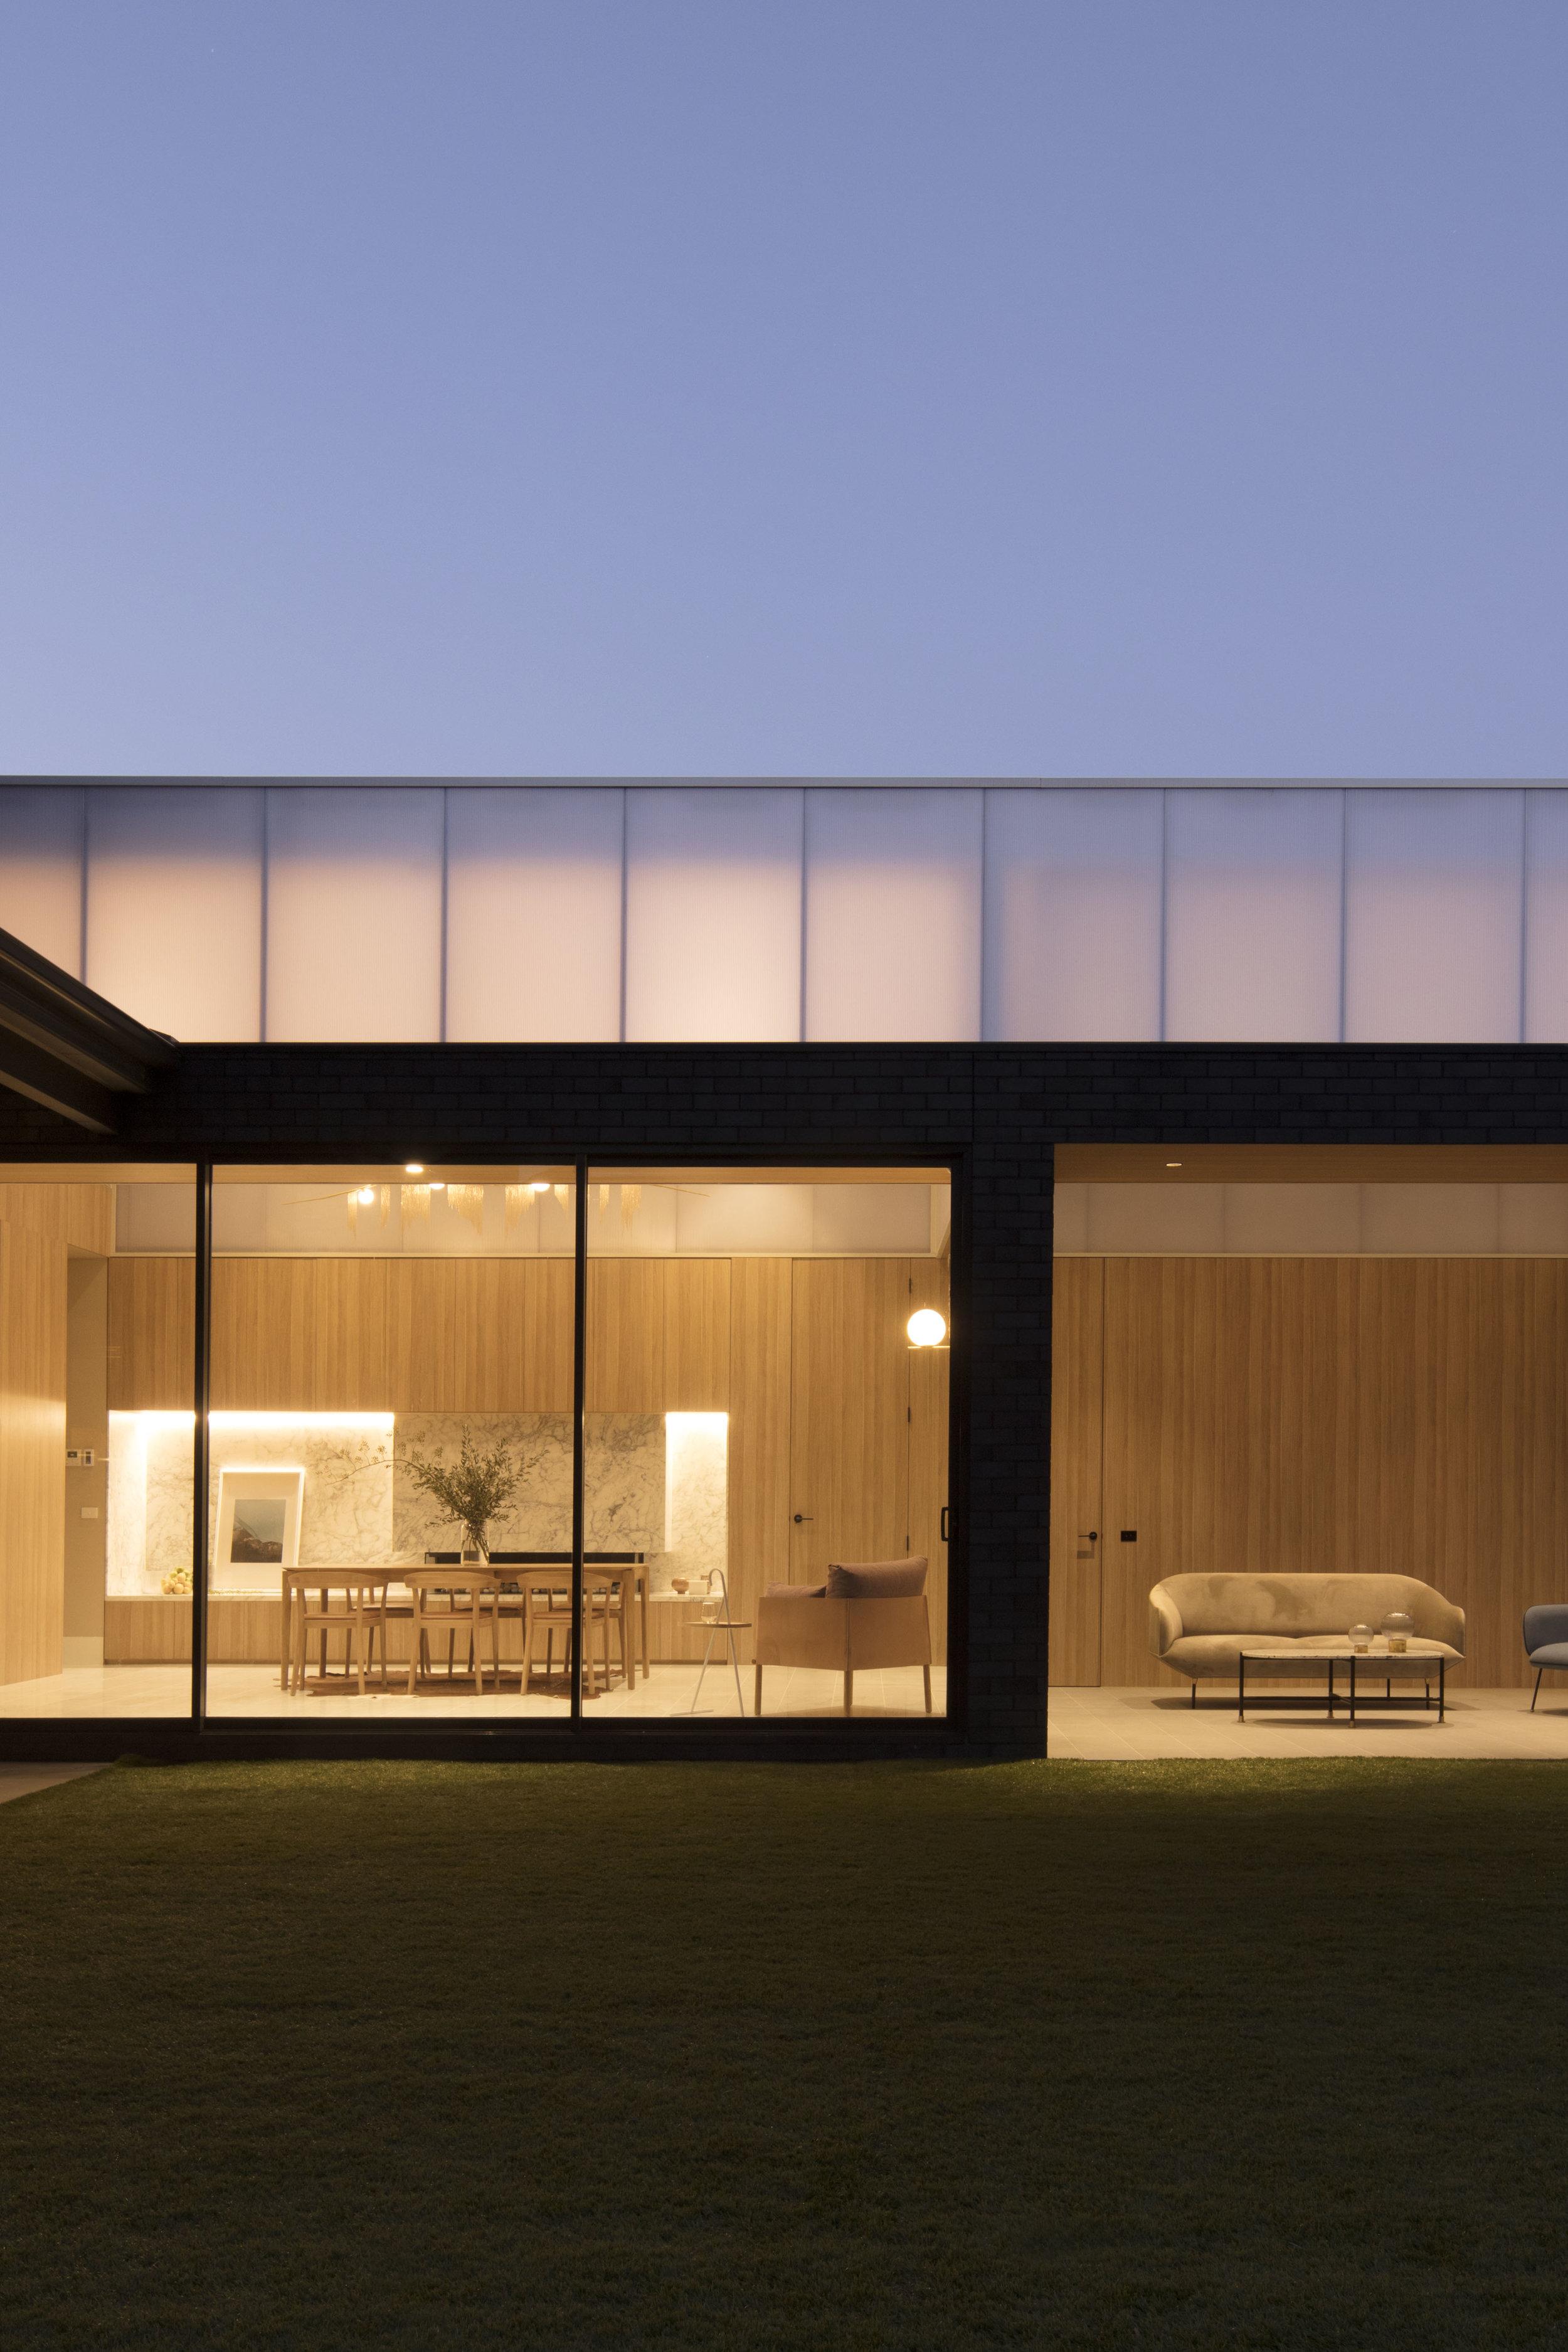 Pitch_Architecture_Lantern House_12